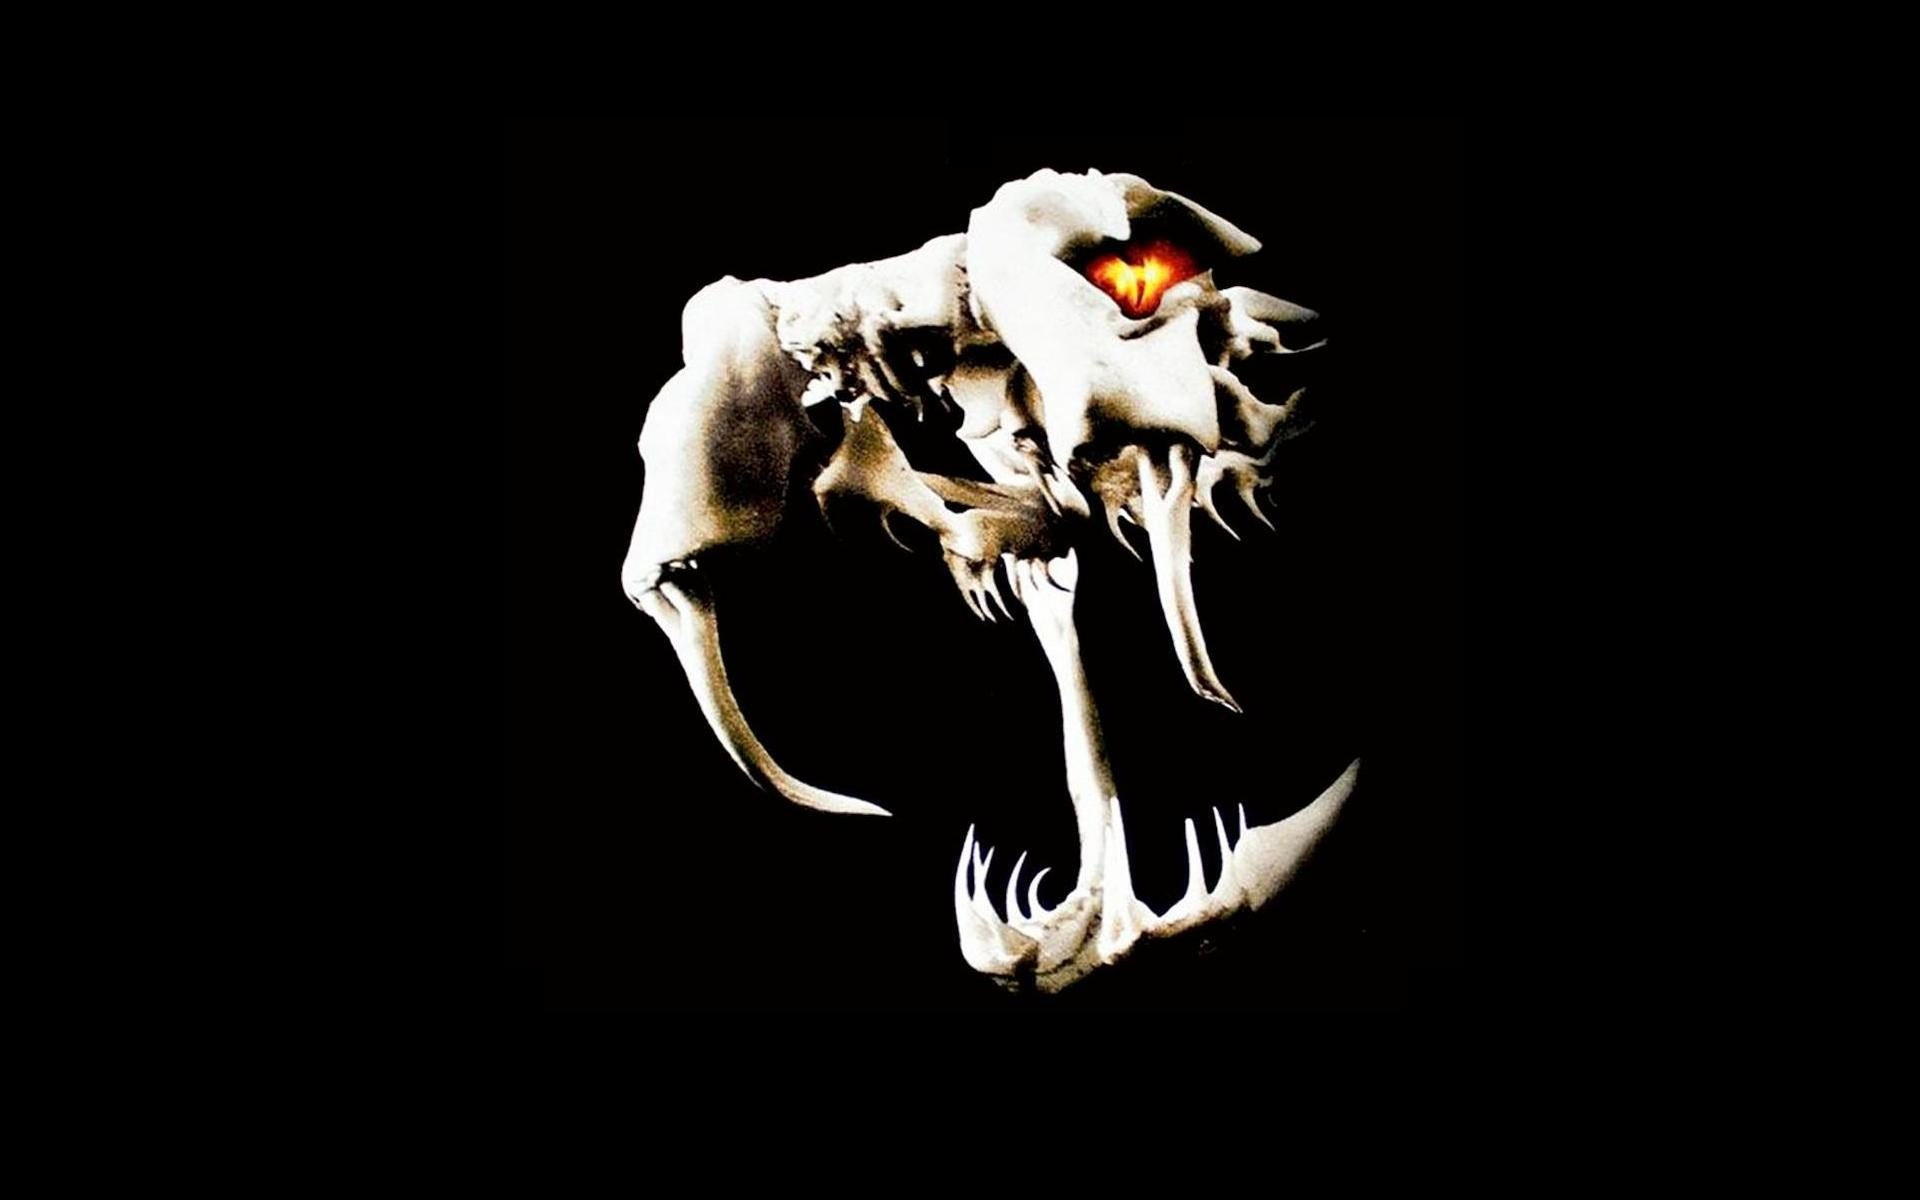 Randy orton viper logo - photo#32